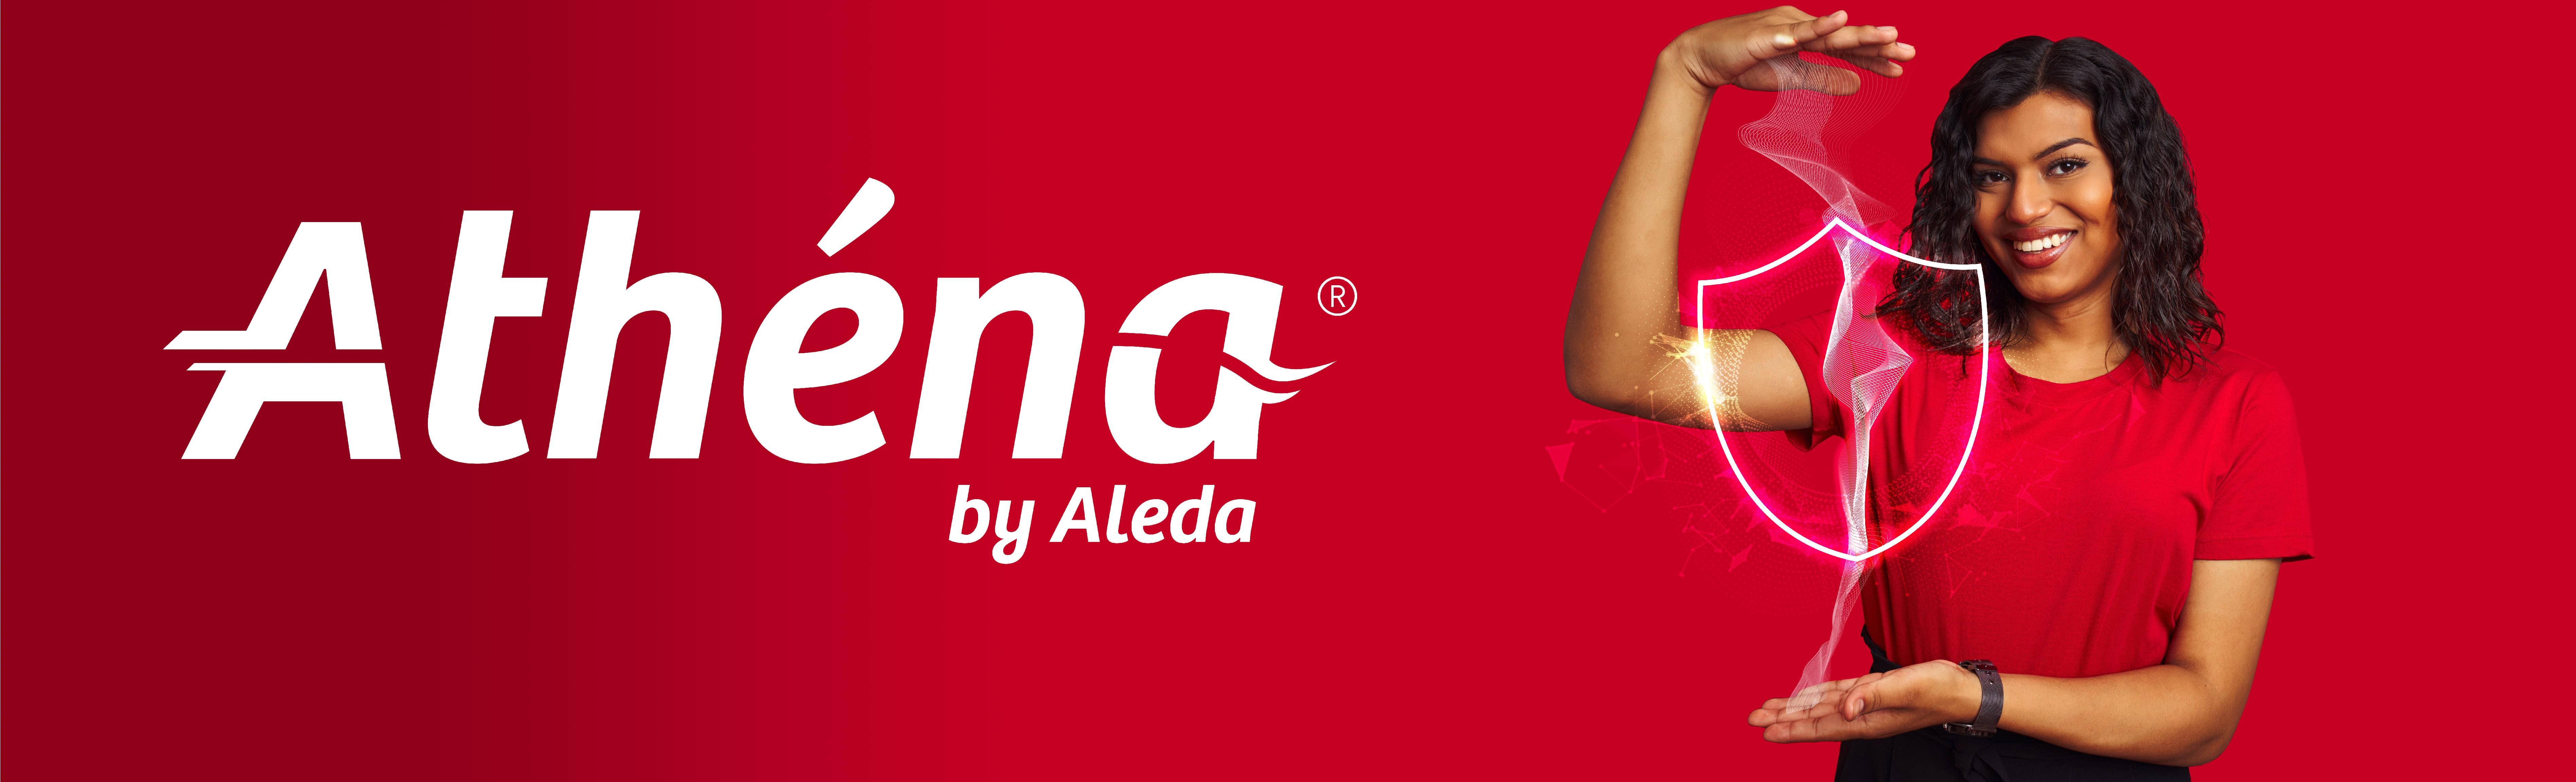 athena-ambassadeur-identite-visuelle-logo-charte-graphique-univers-reference